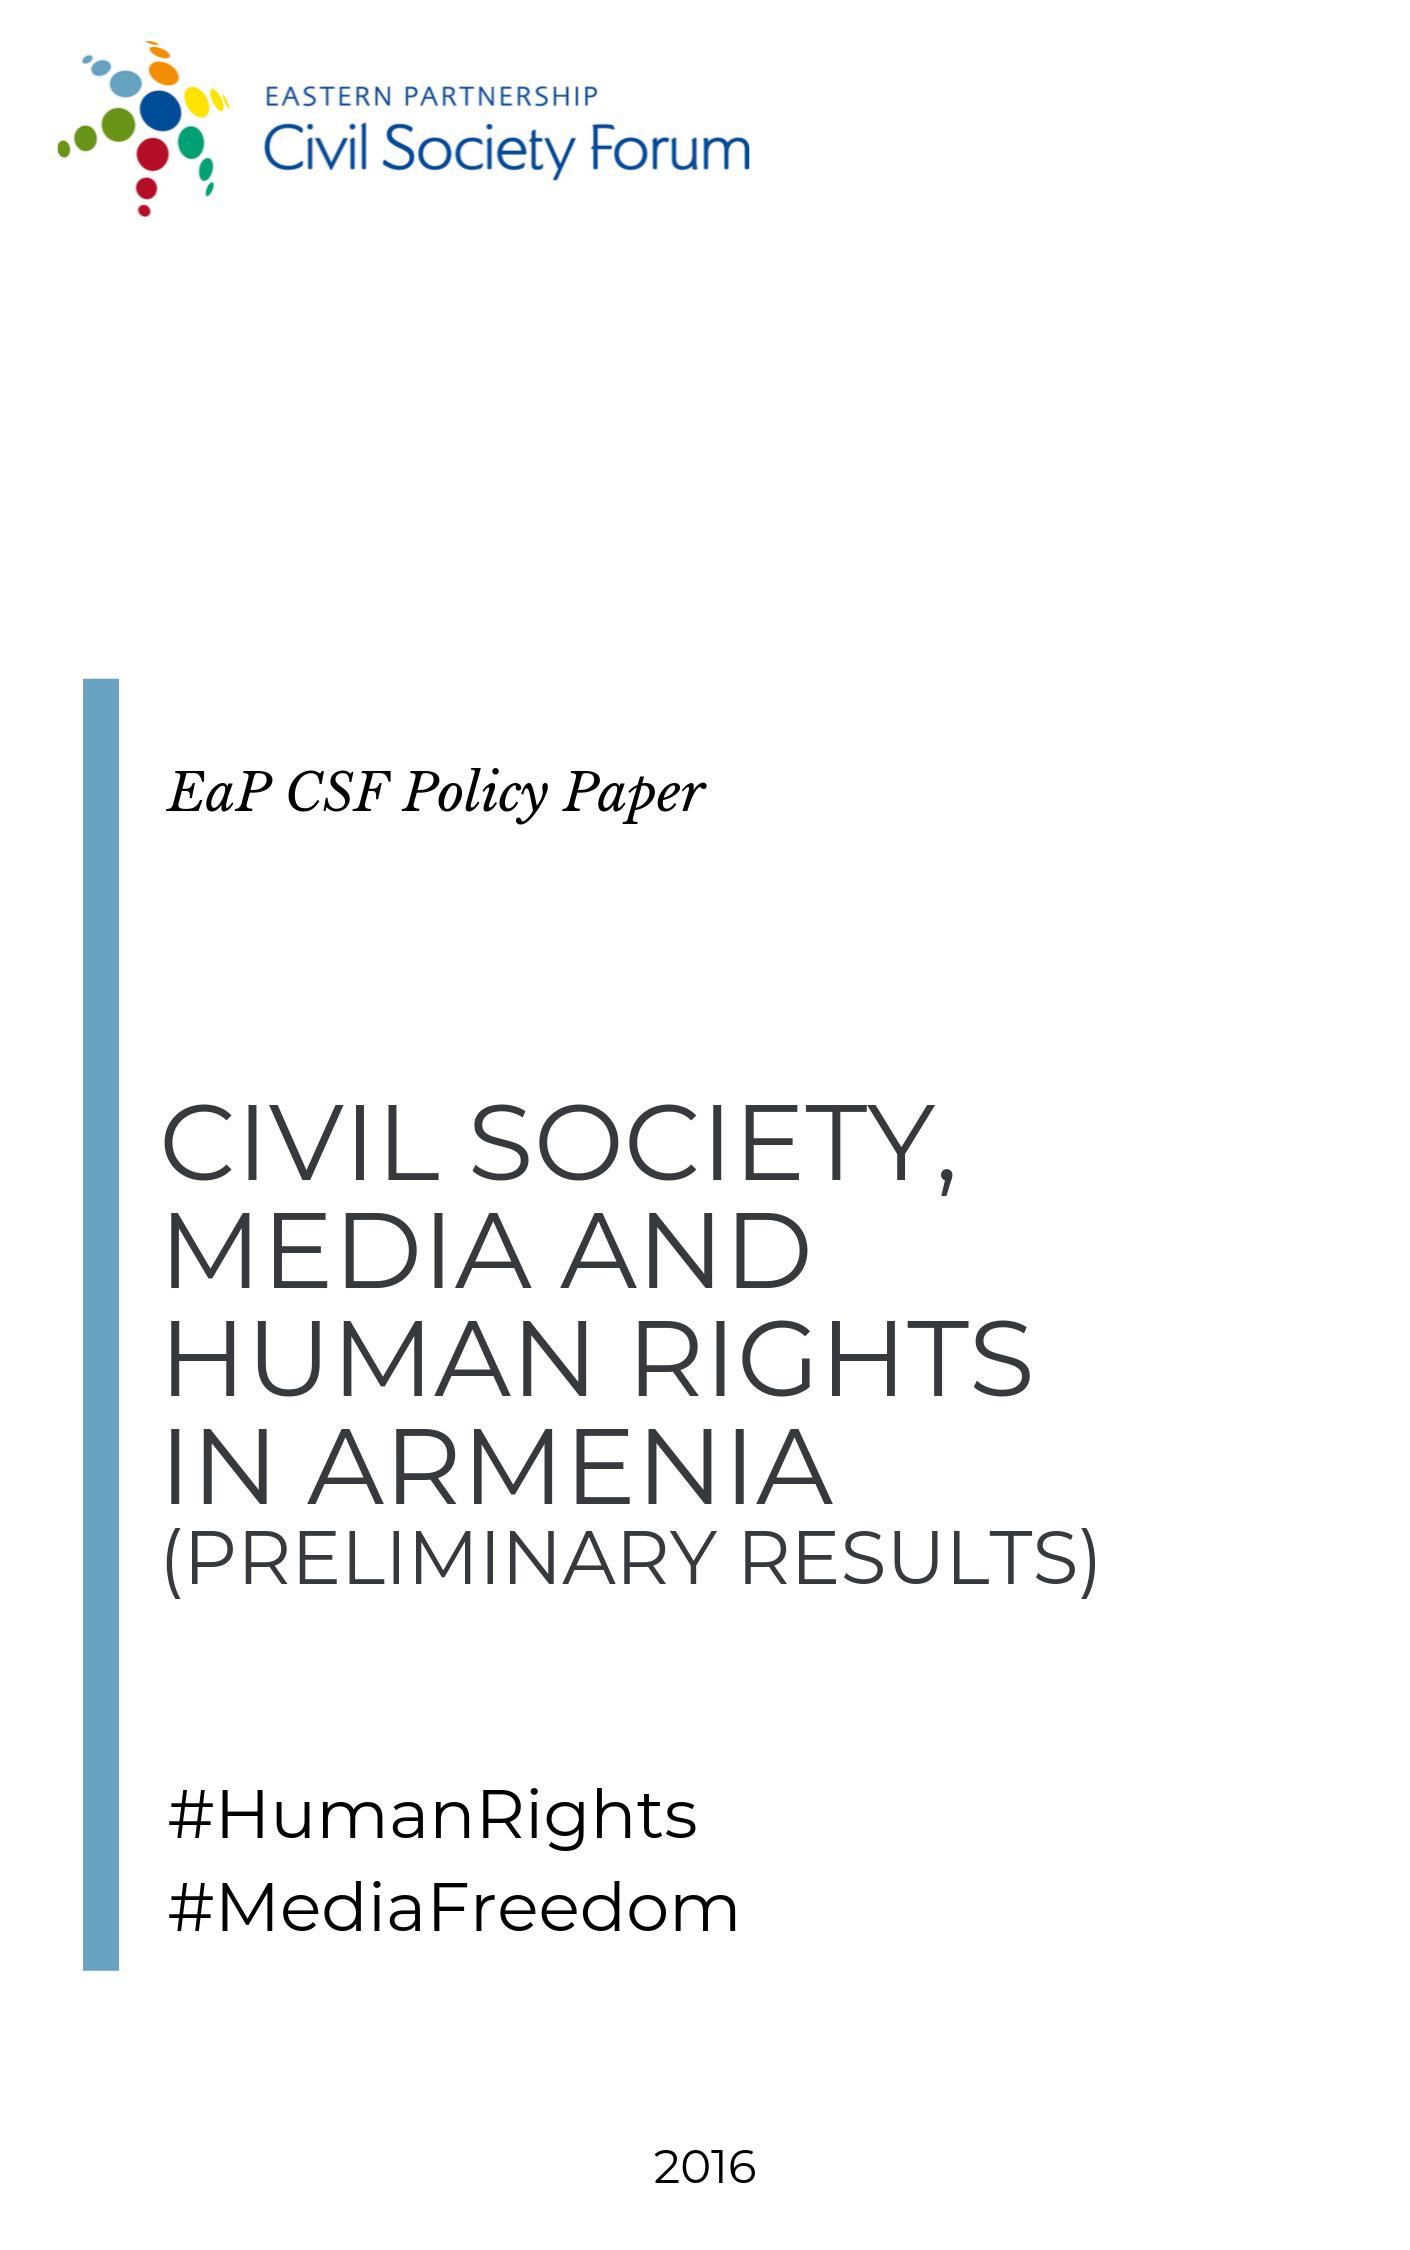 Civil Society, Media and Human Rights in Armenia (Preliminary Results)